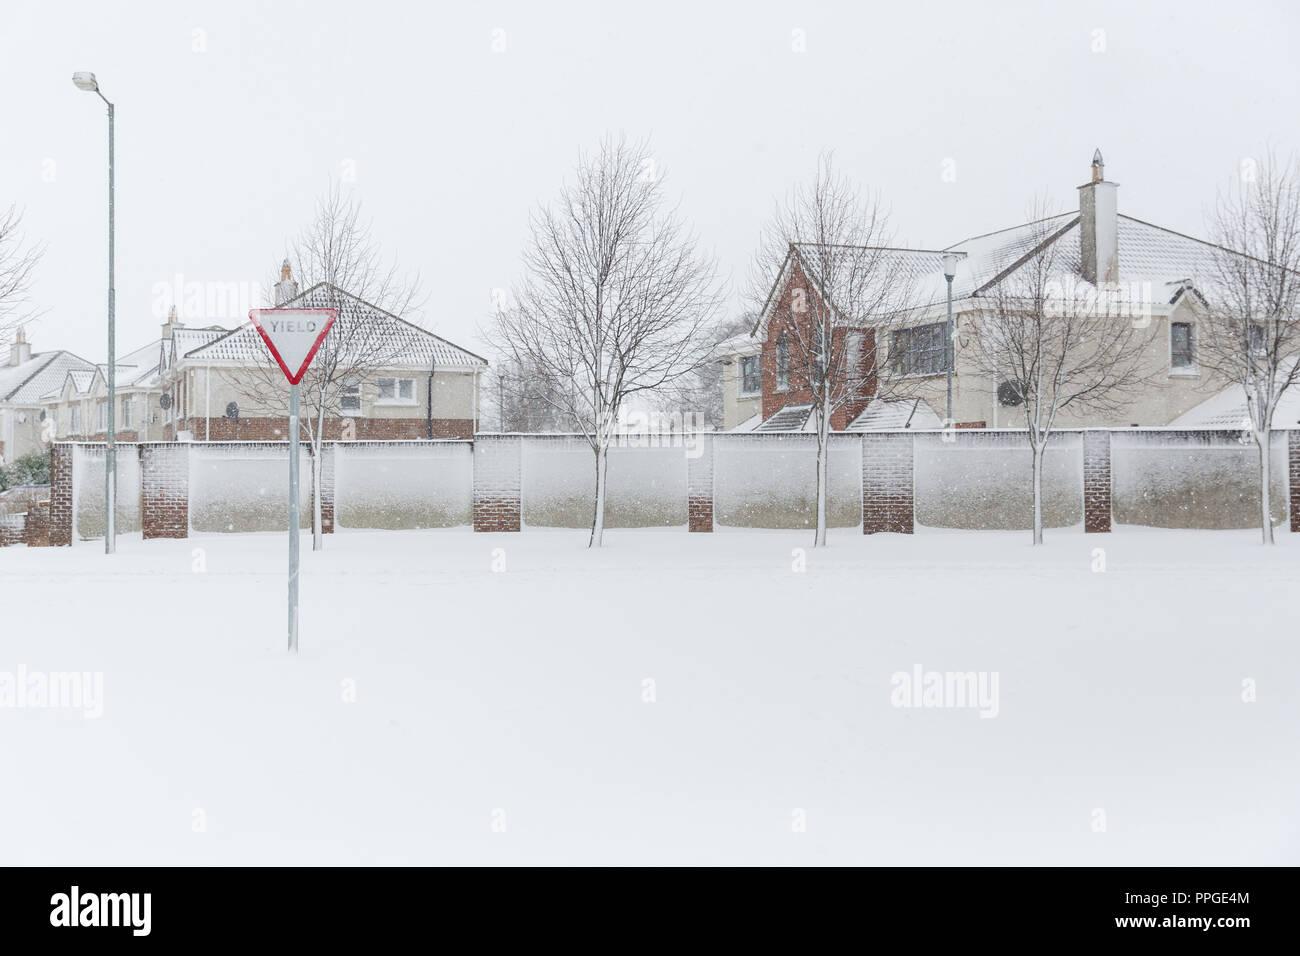 Snowed in housing estate in Celbridge, County Kildare, Ireland - Stock Image